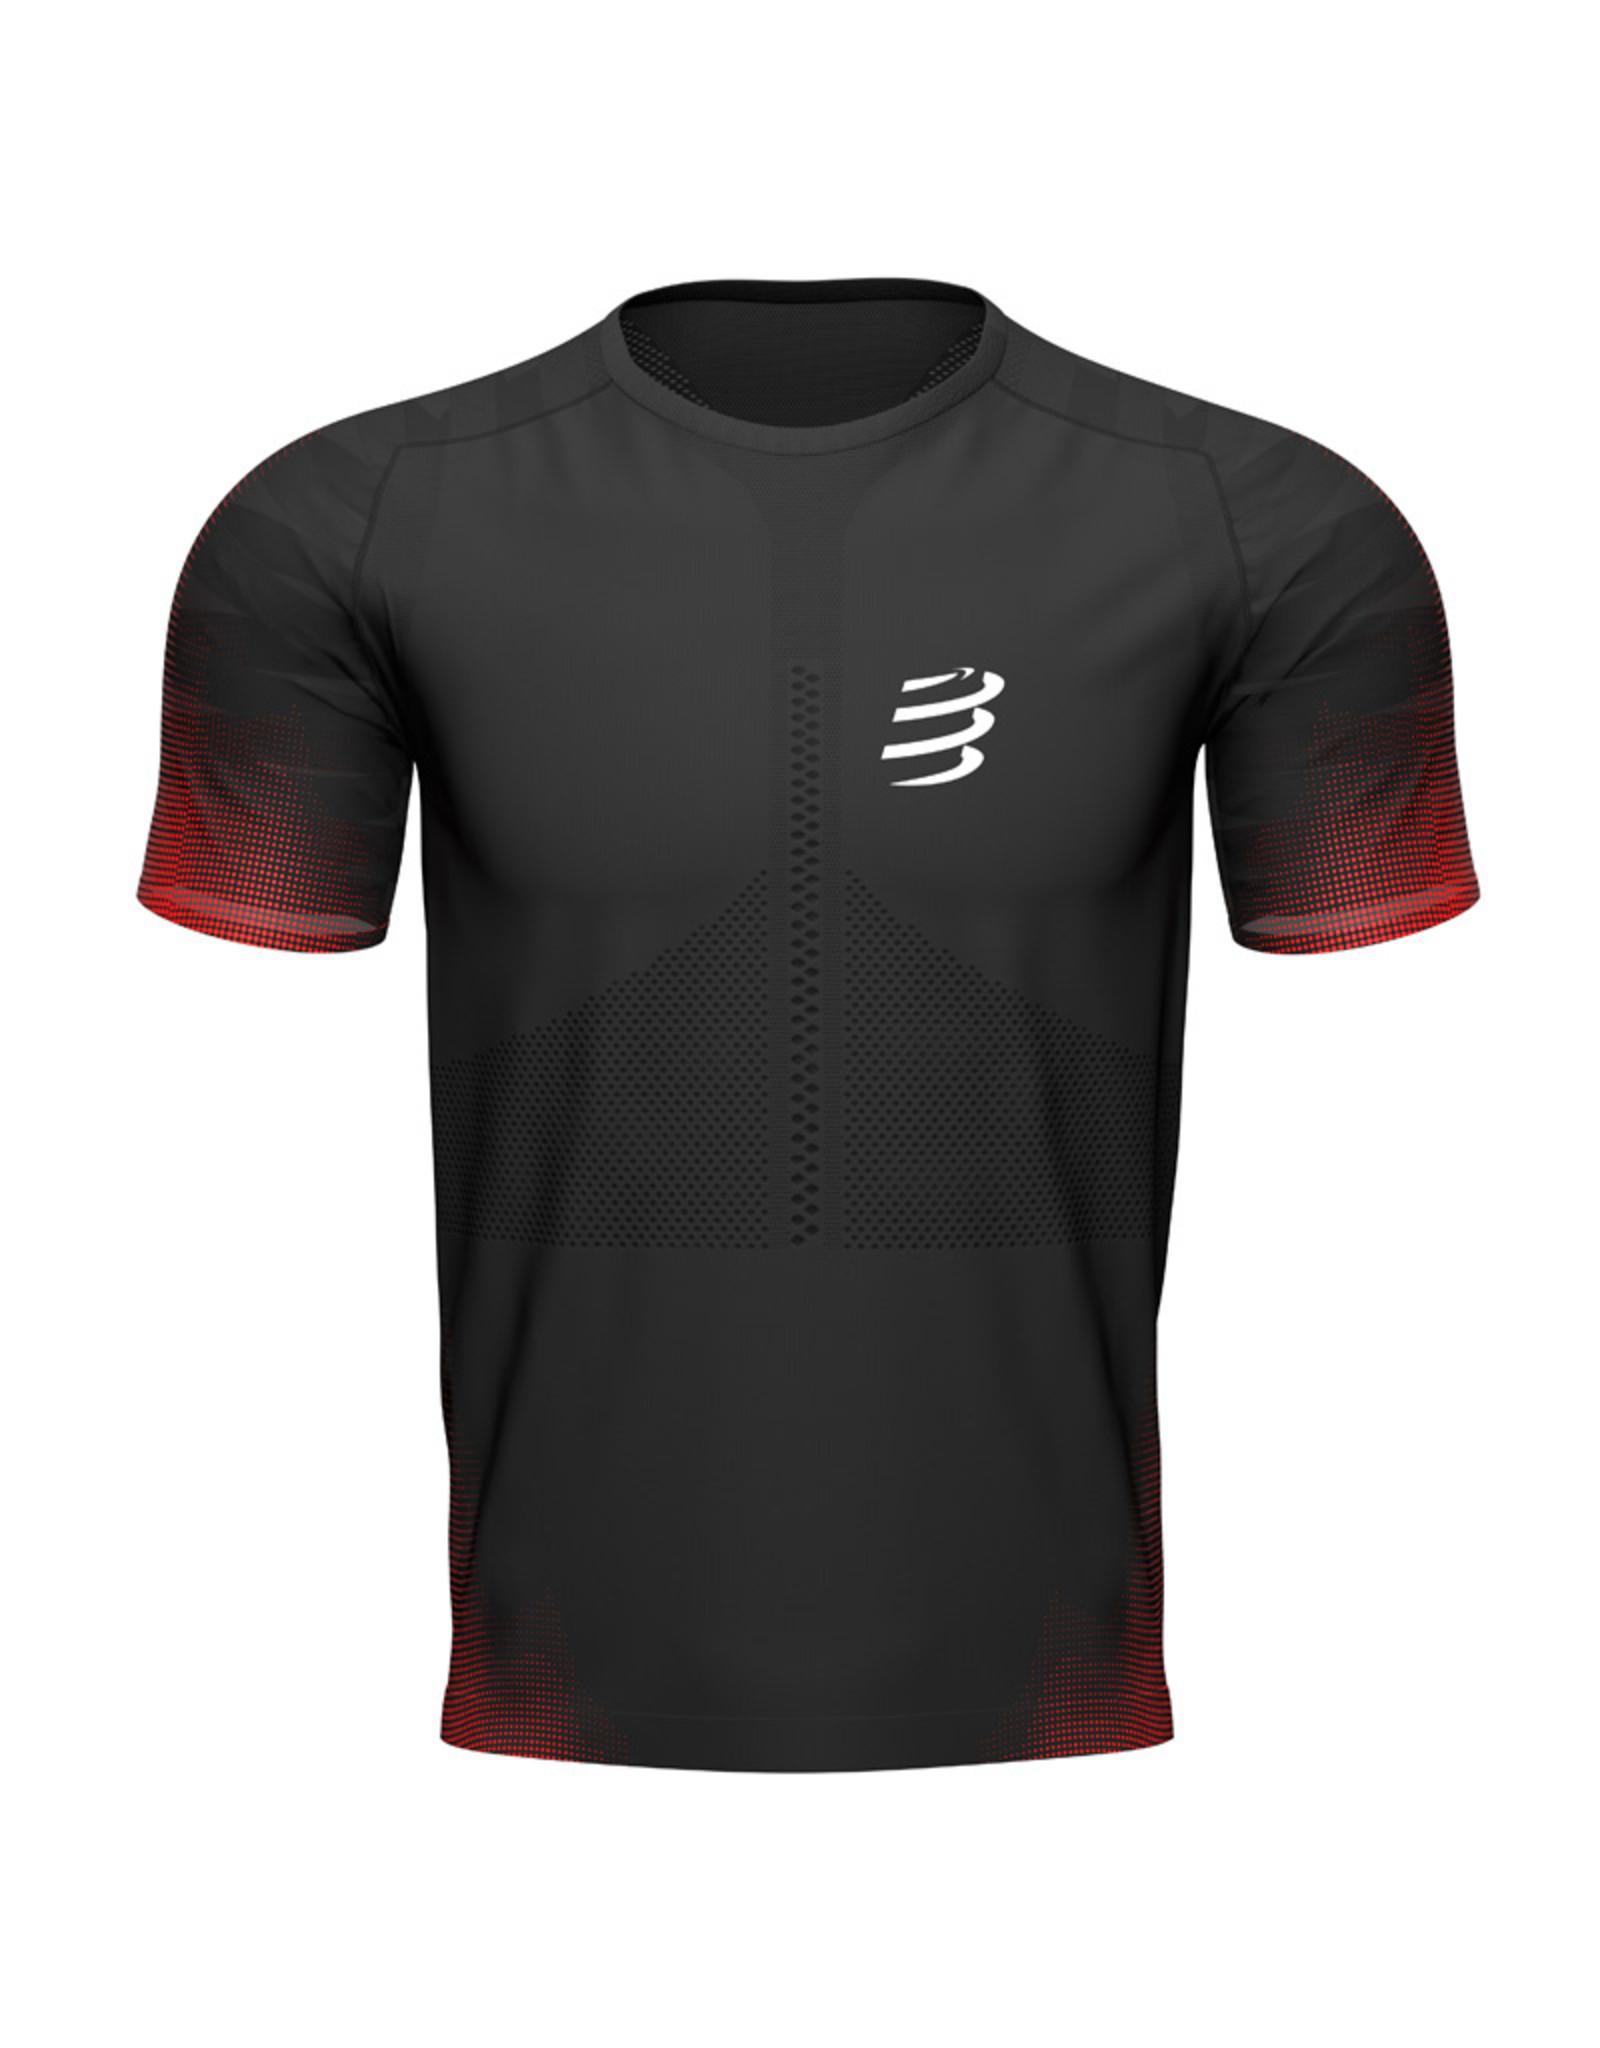 Compressport Racing SS Tshirt - Noir